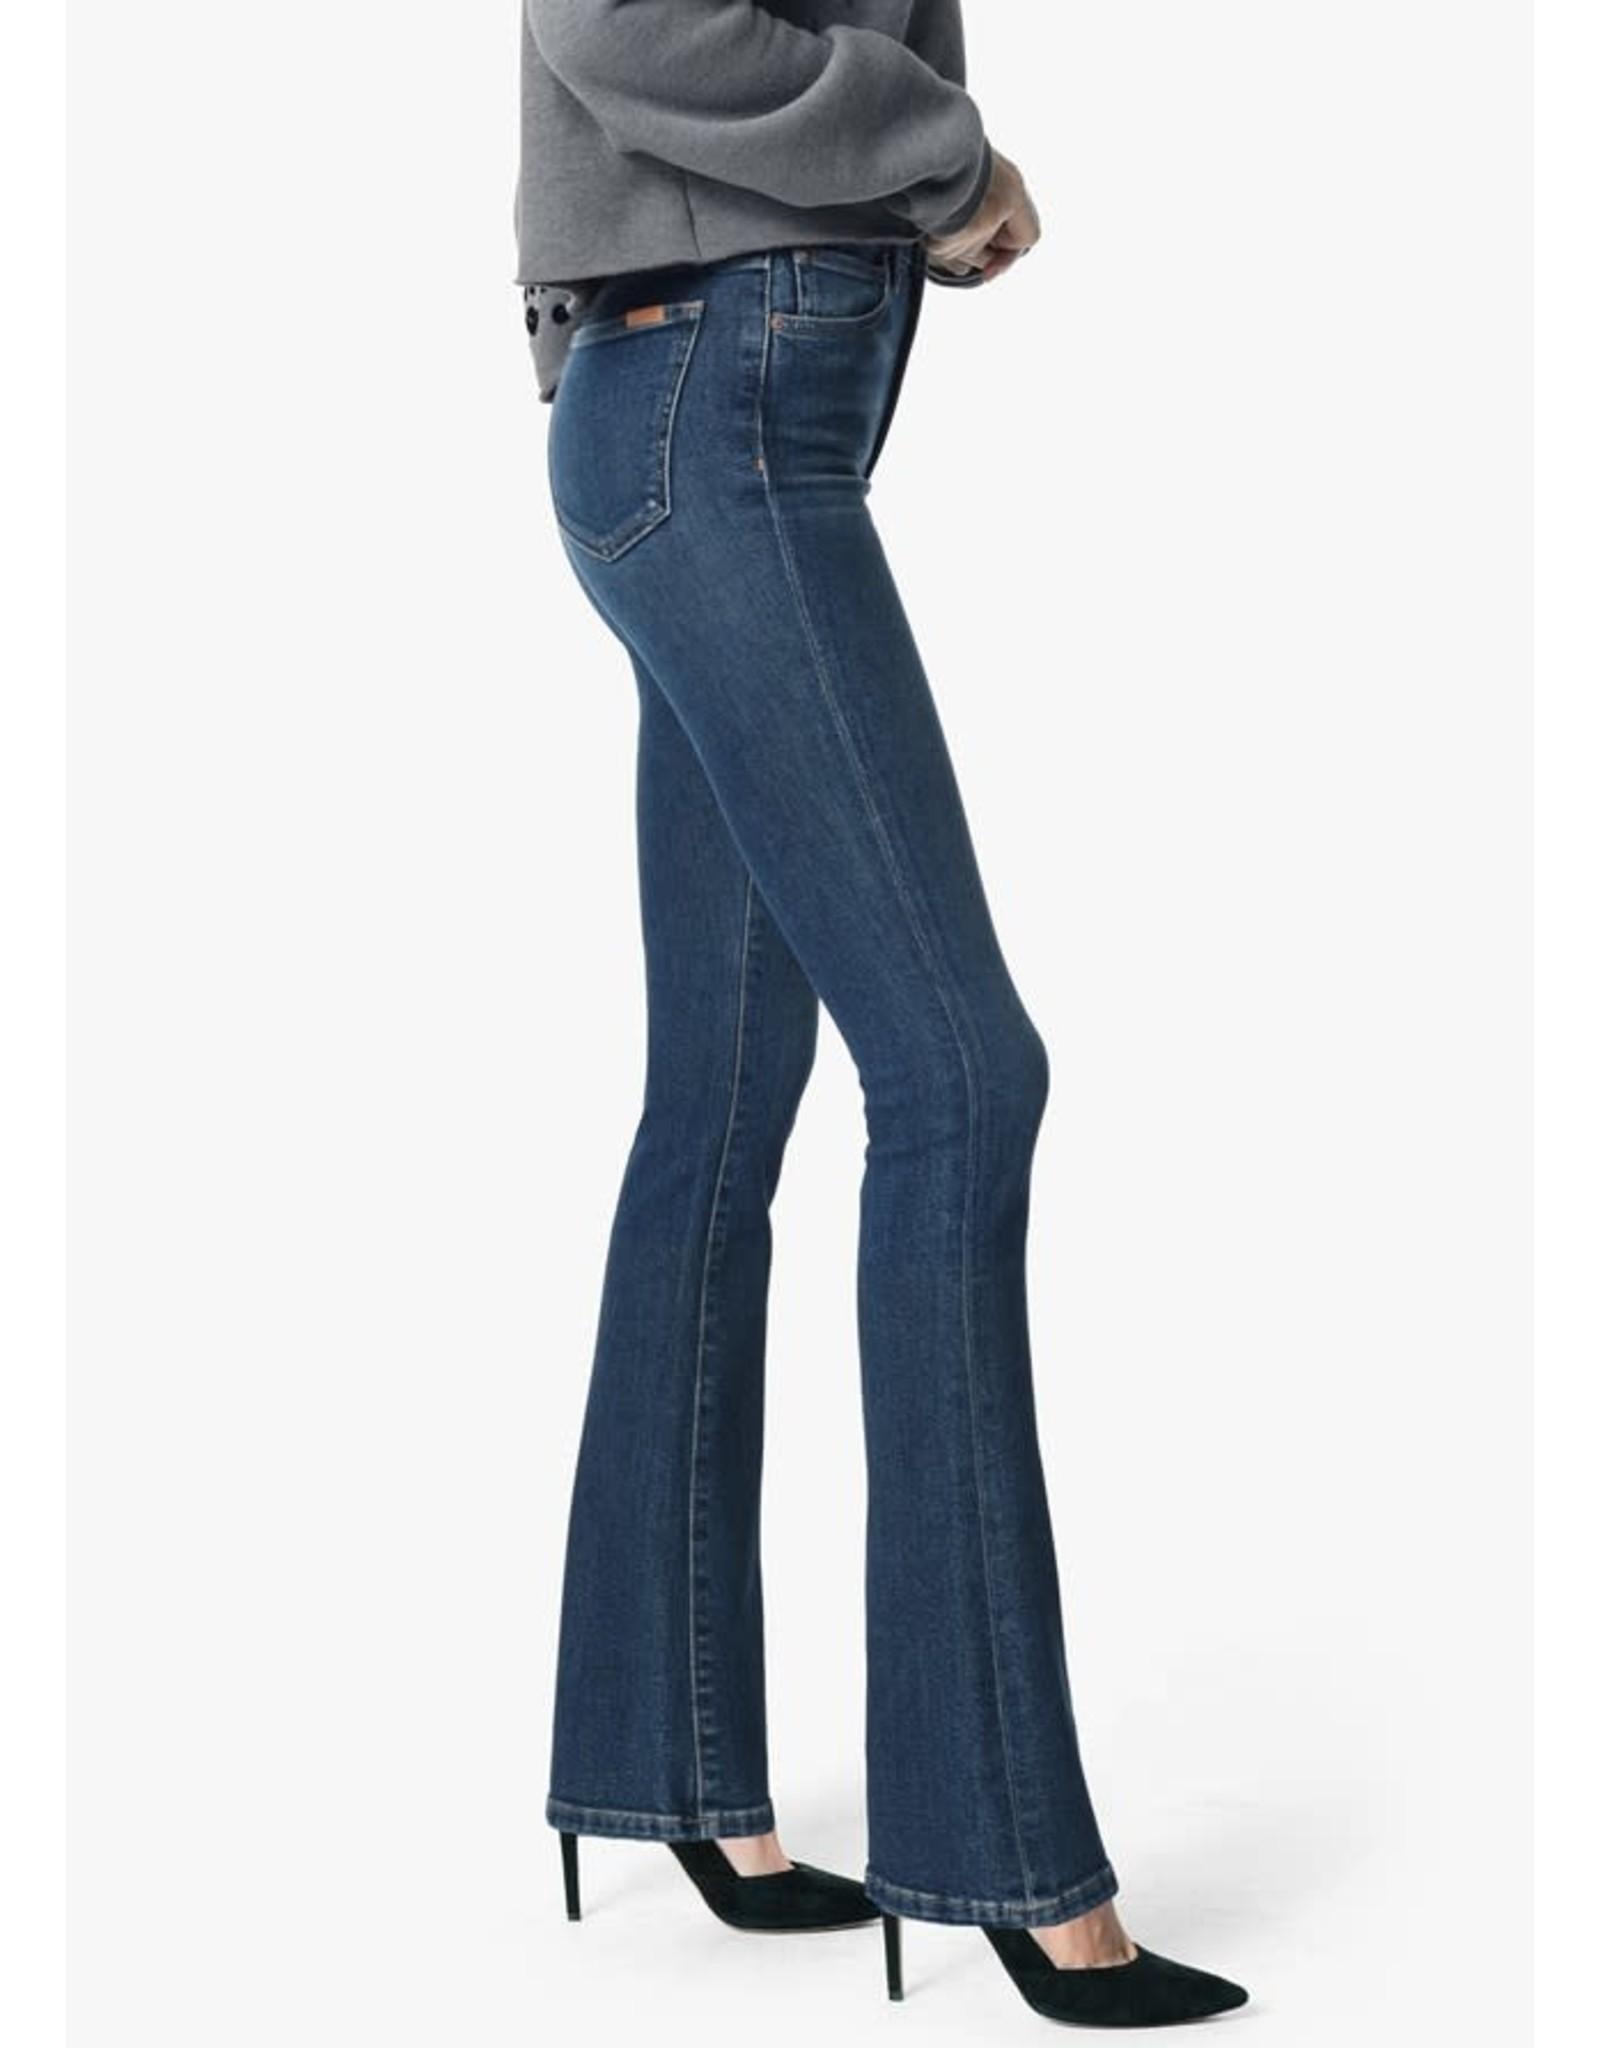 Joes Jeans Hi Honey Bootcut